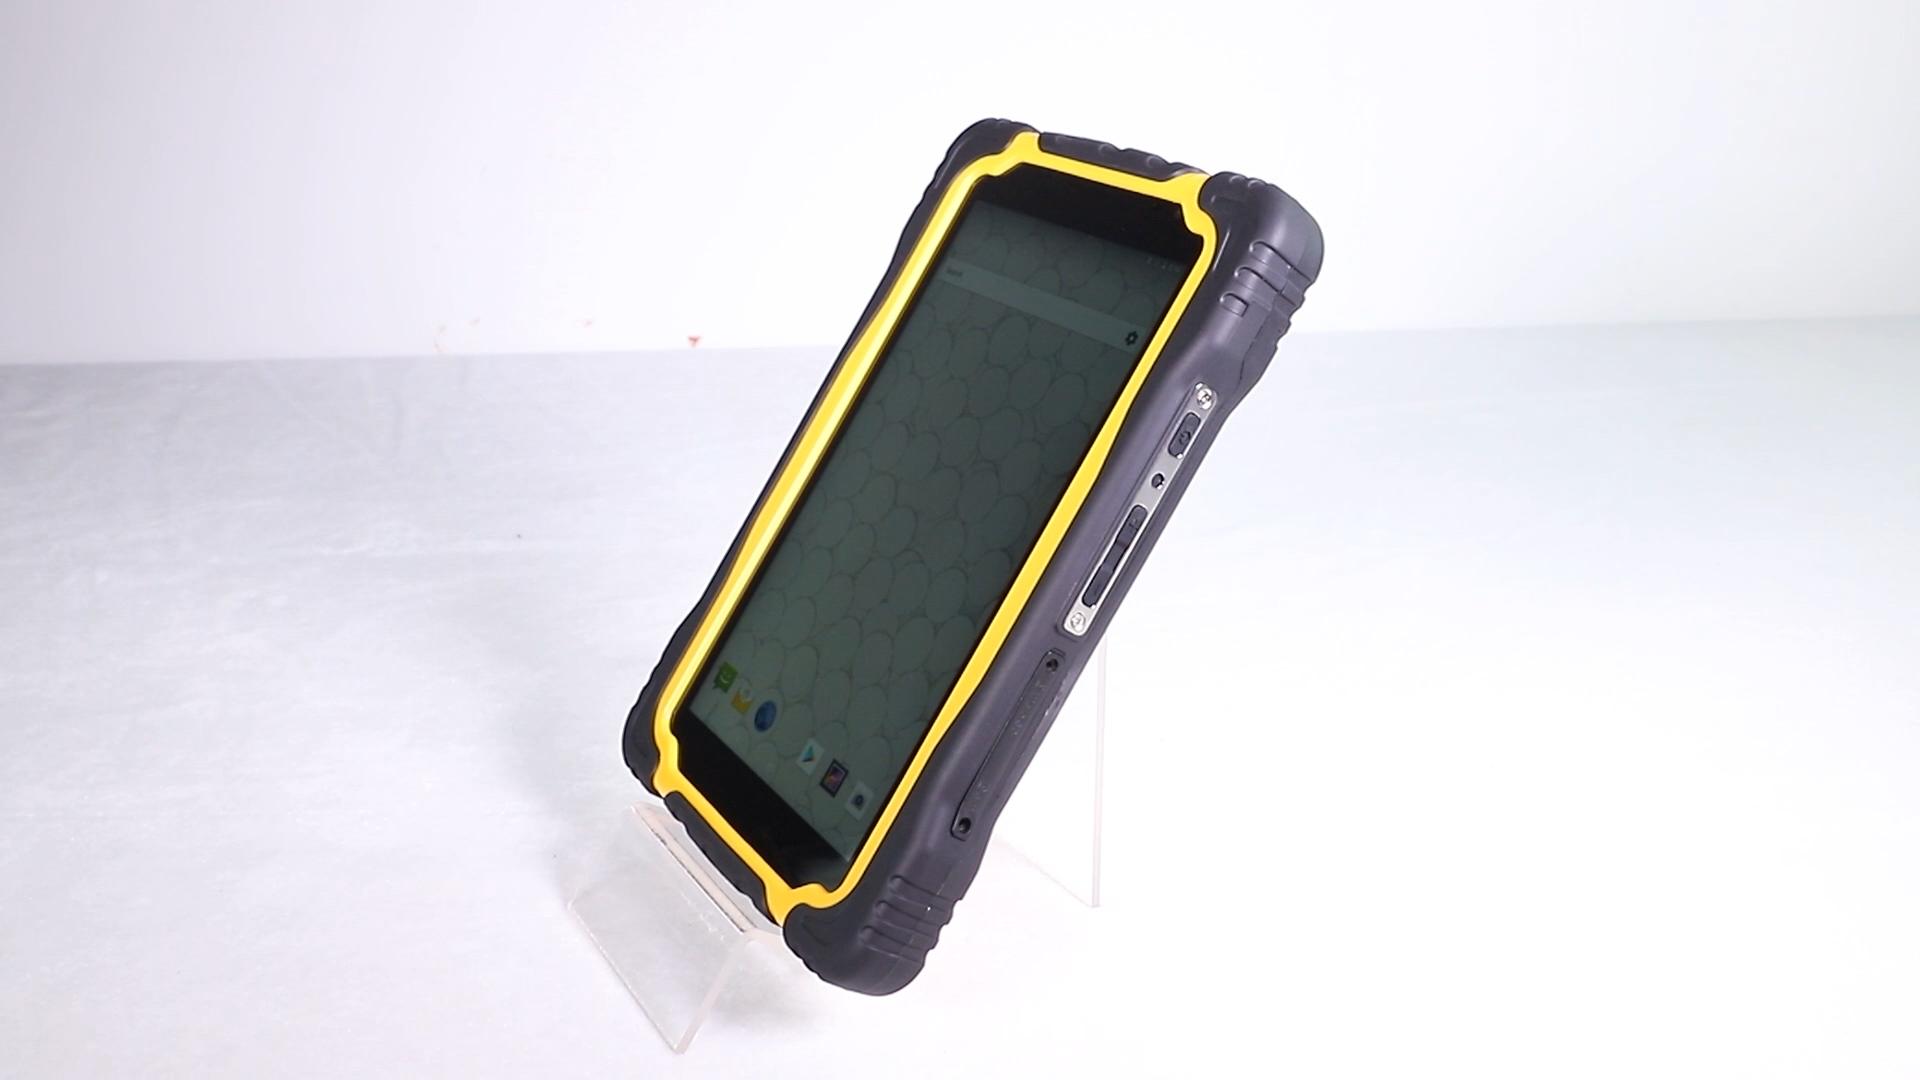 T70 OEM Android Ponsel Tablet 7 Inci Kartu Sim 3G Android Kasar Tablet